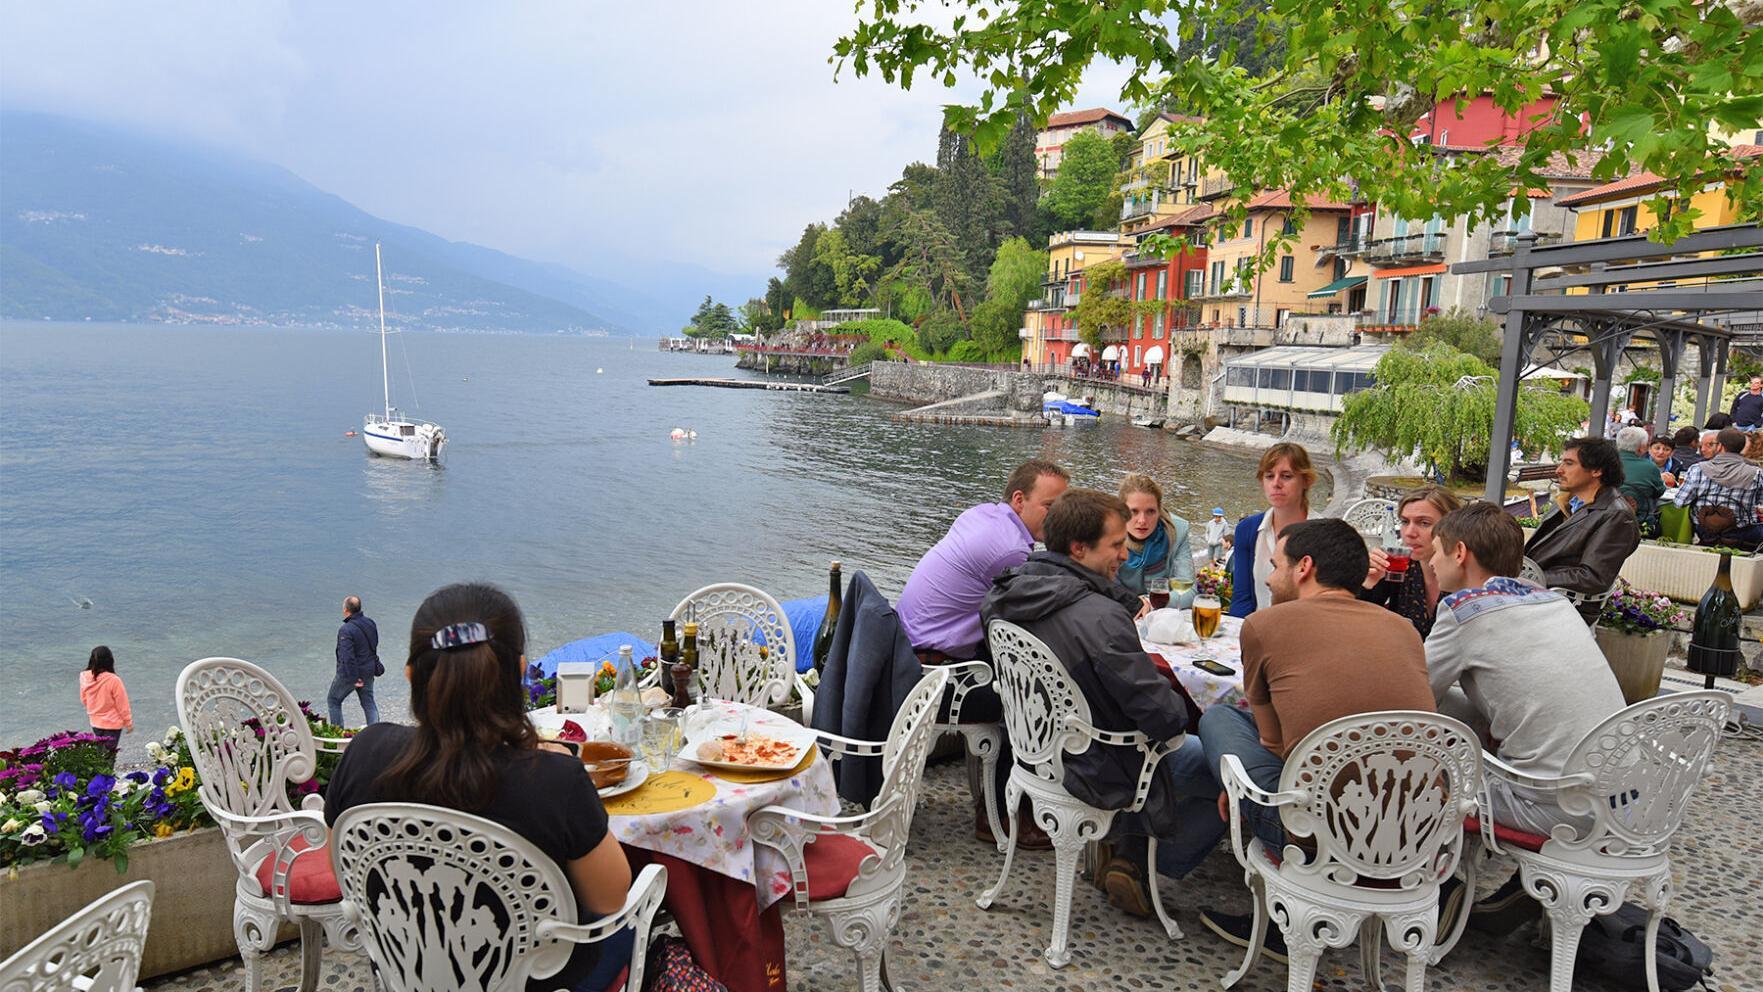 Rick Steves' Europe: Lago di Como: Where Italians honeymoon